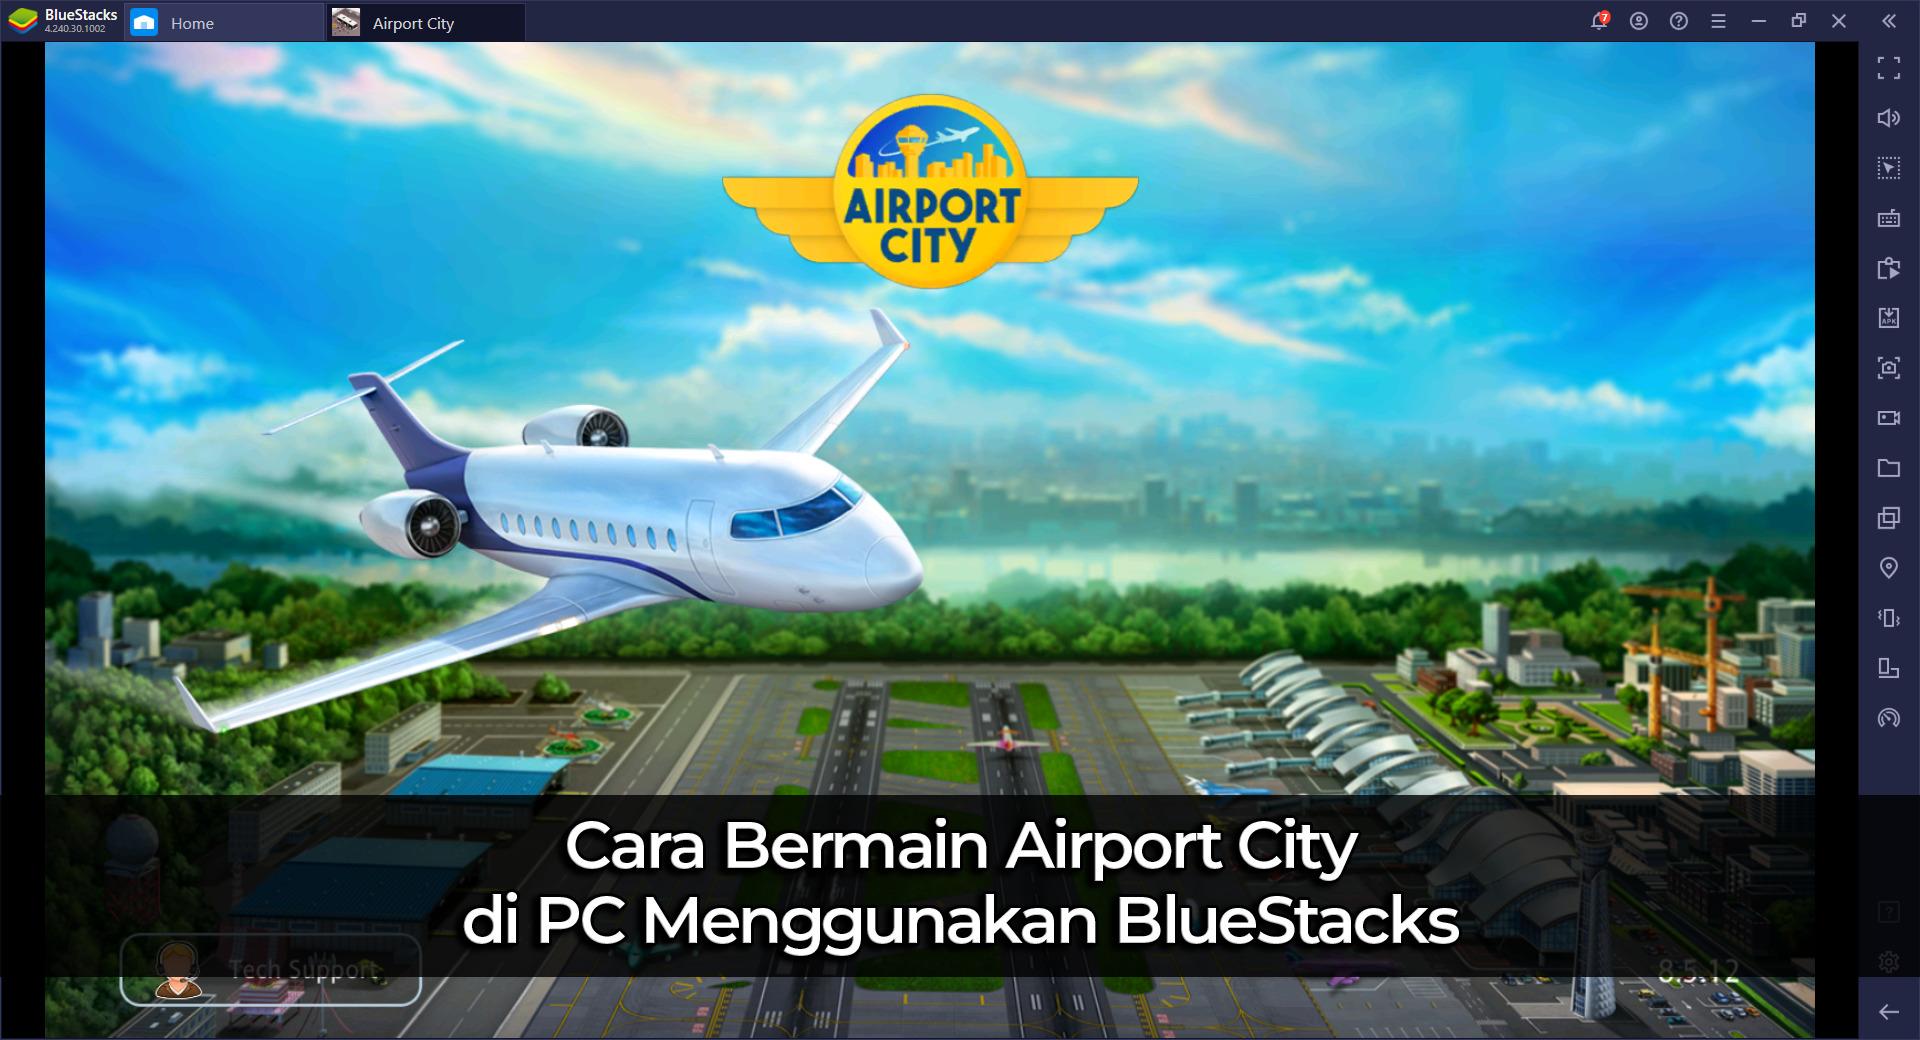 Cara Bermain Airport City di PC dengan BlueStacks